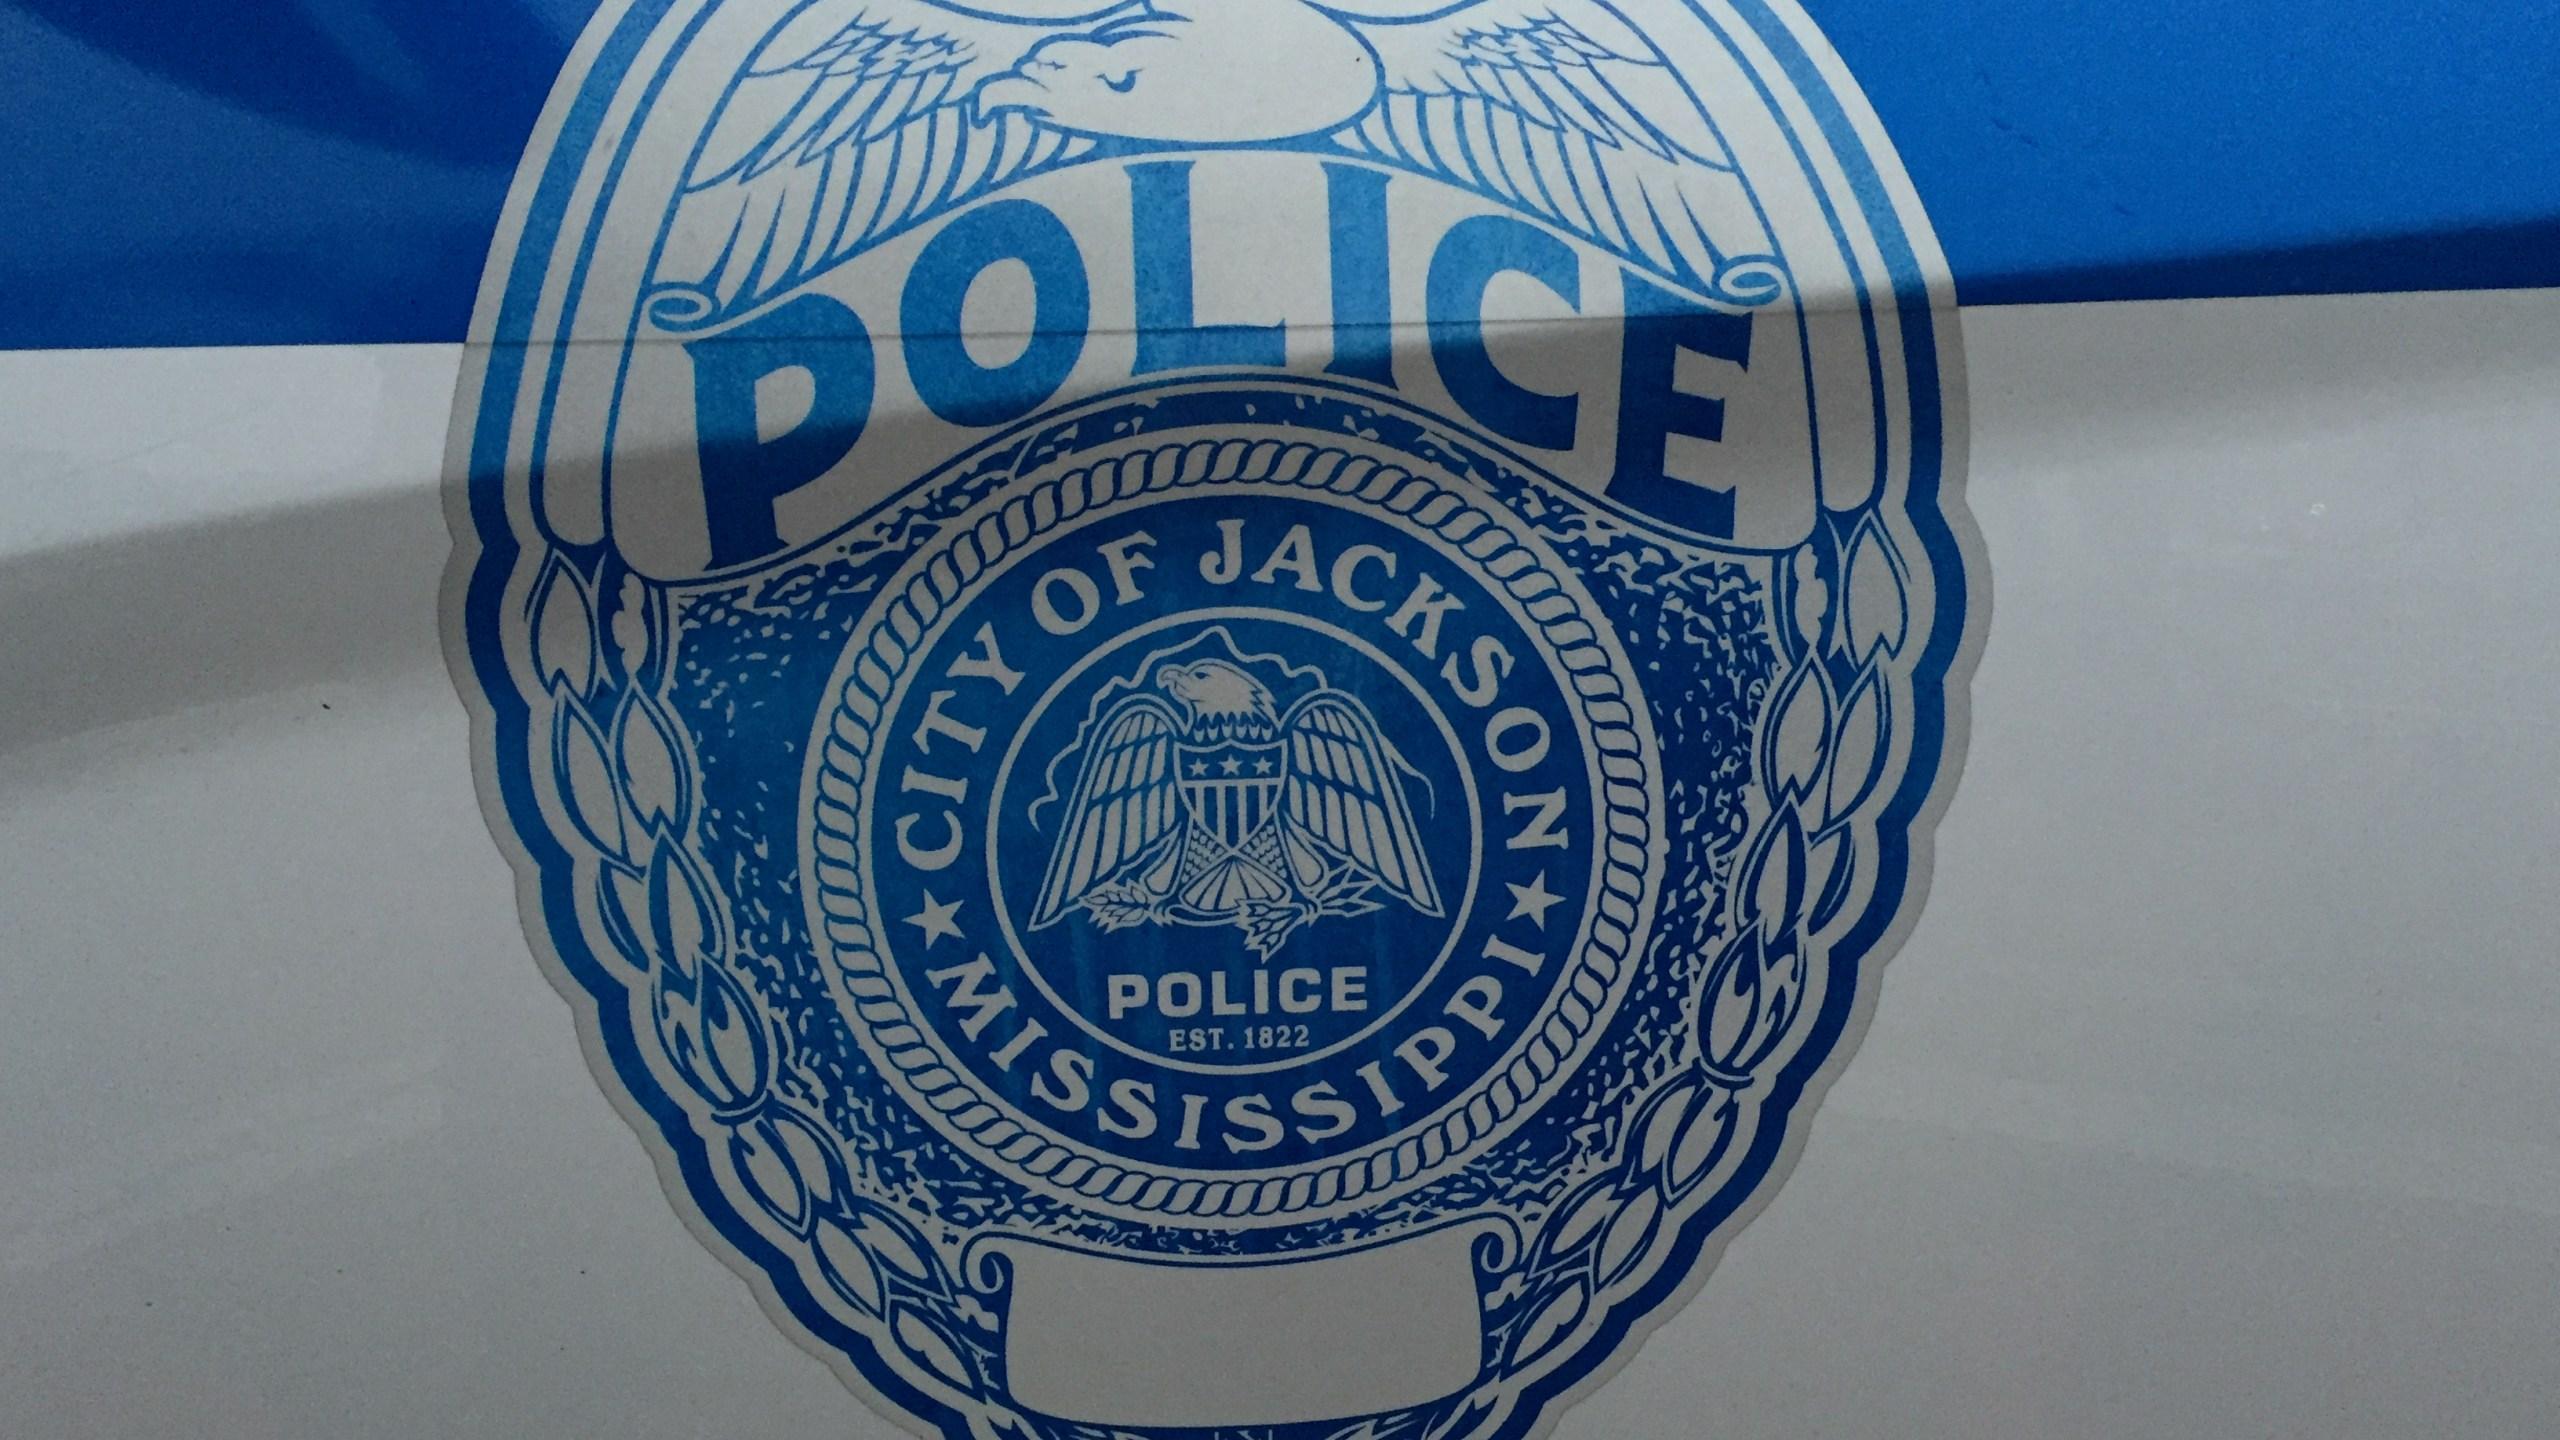 Jackson Police Dept. Generic_1525385914118.jpg.jpg